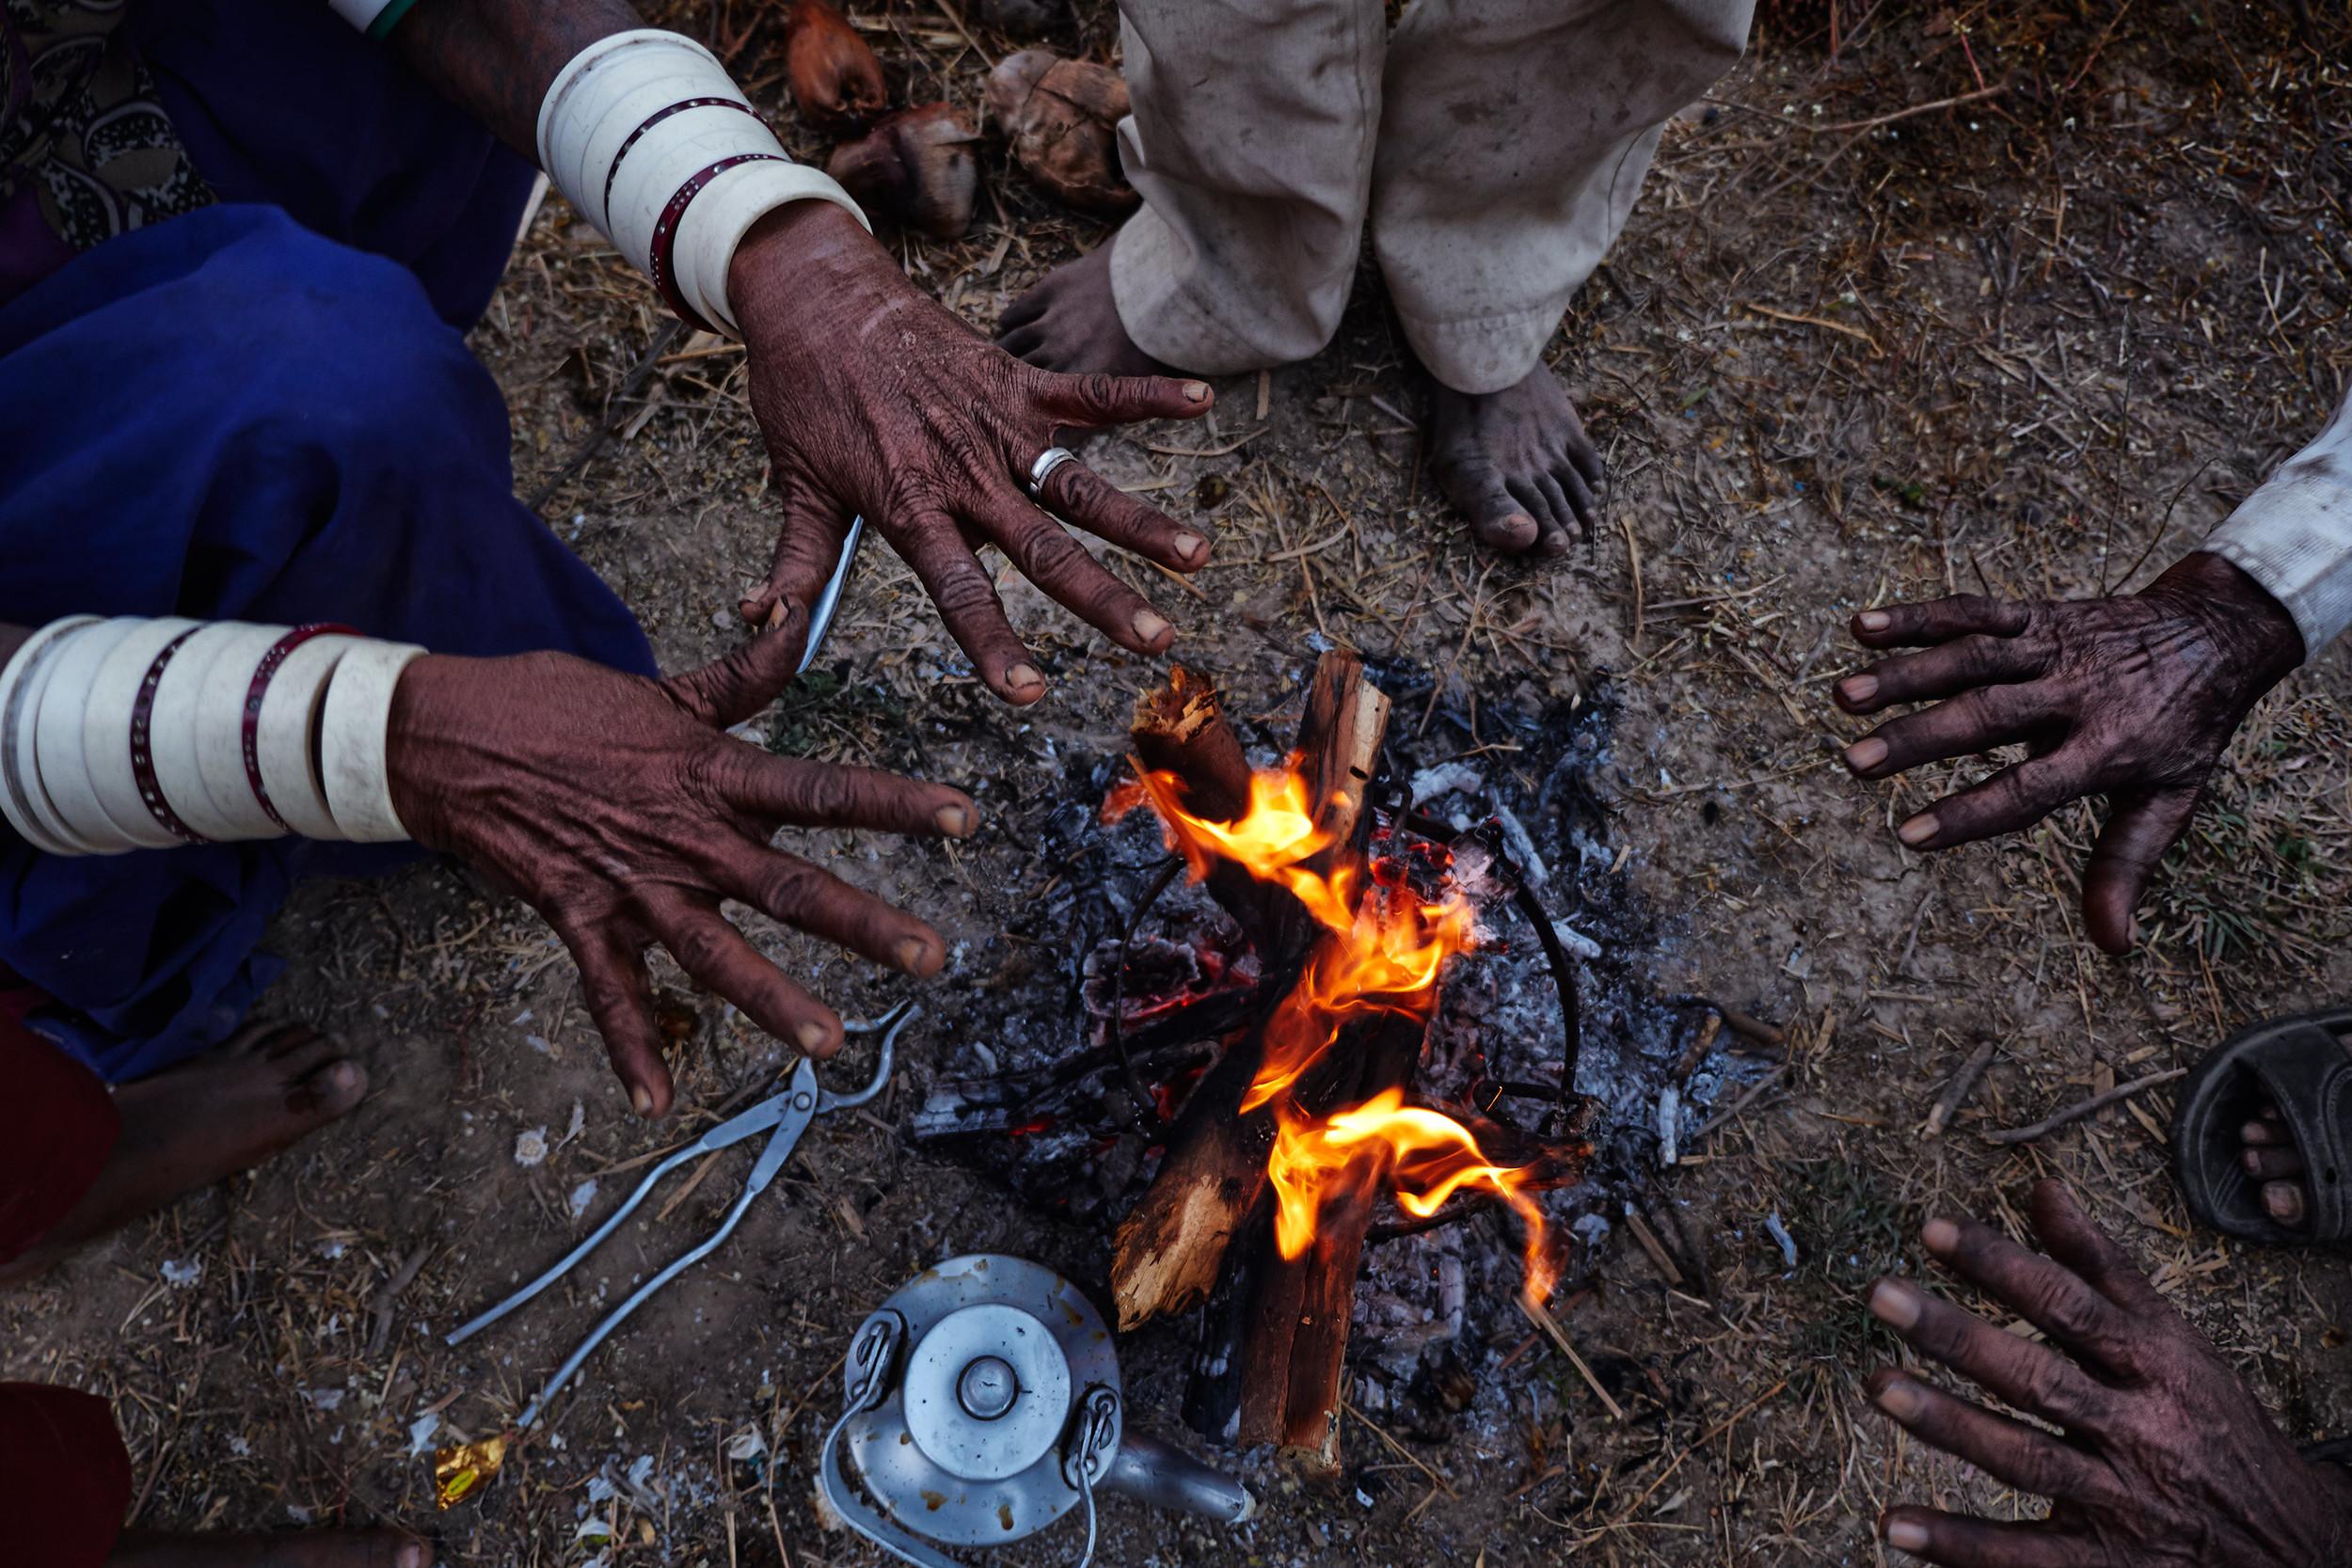 Nomads' hands around a fire